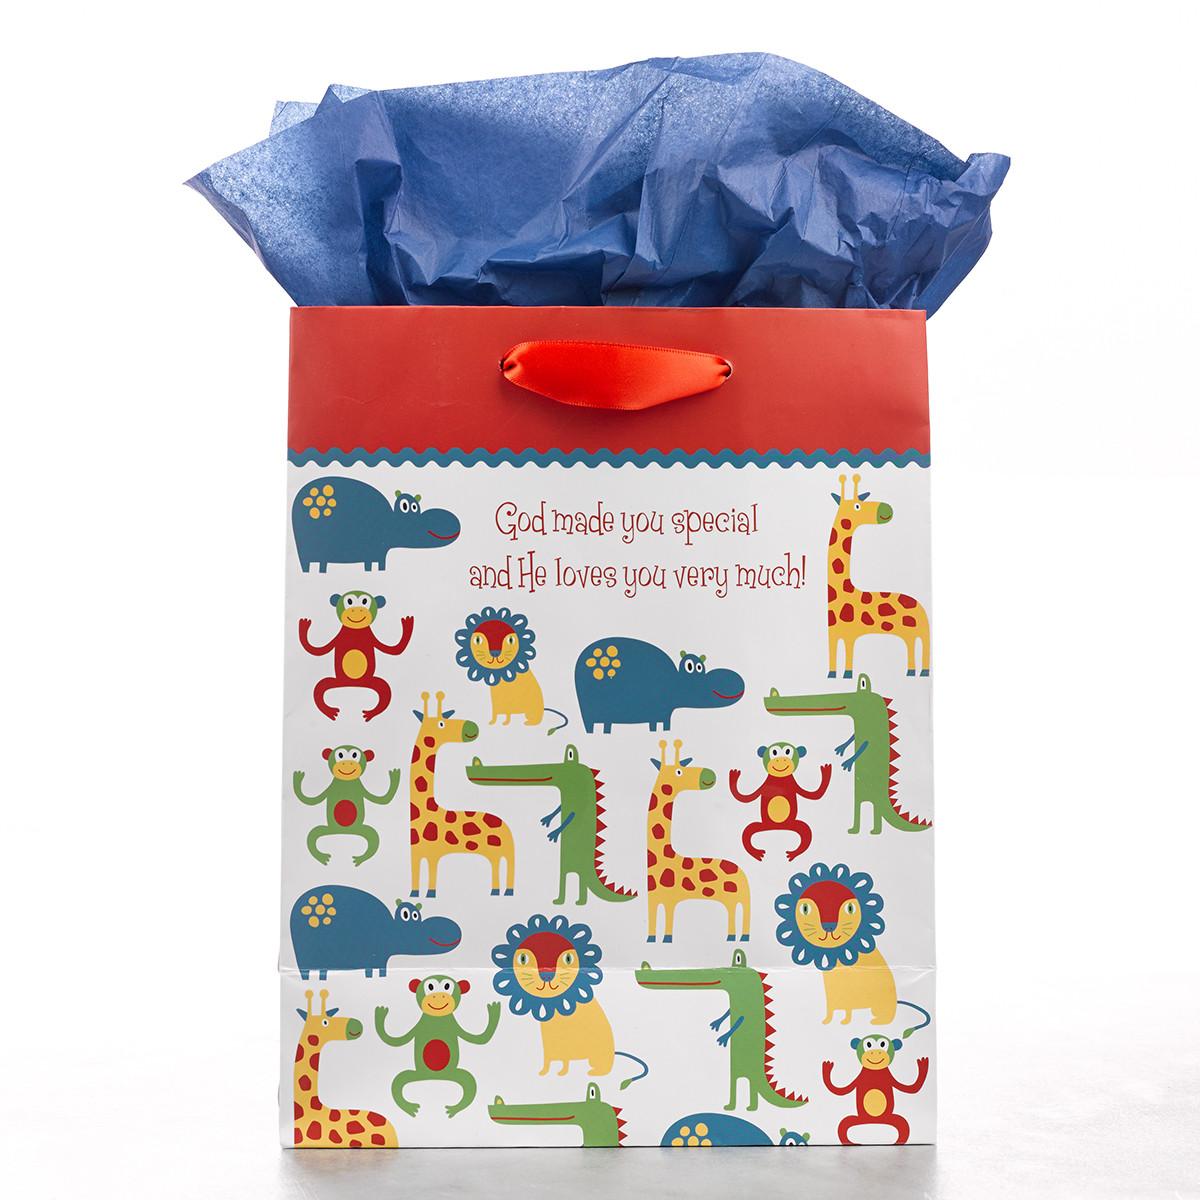 A Little Surprise Medium Gift Bag gift bag, medium gift bag, tissue and bag, gift wrap, GBA036